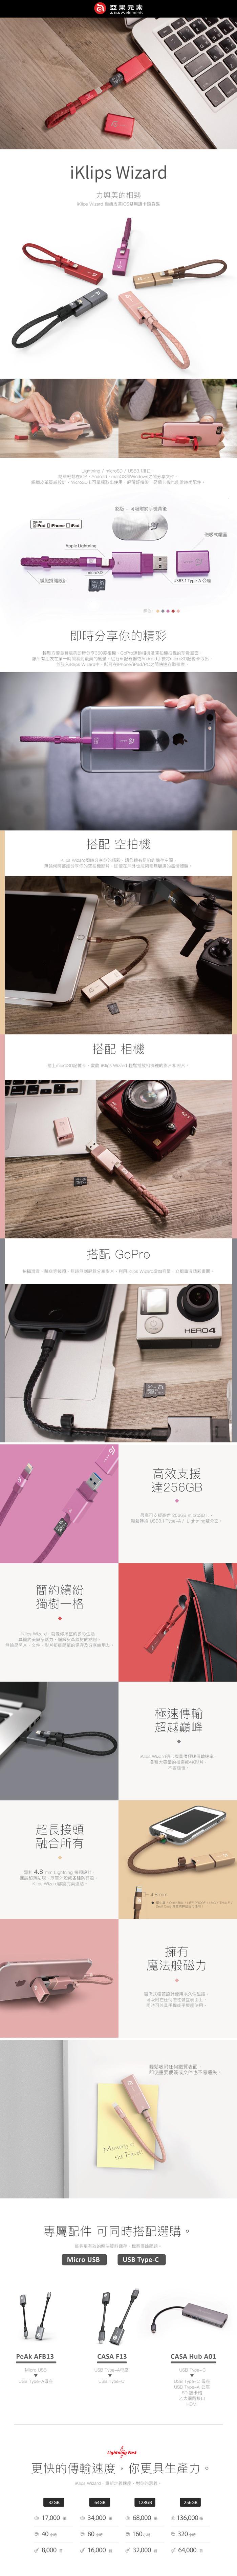 ADAM|iKlips Wizard 蘋果iOS USB3.1 microSD 三合一4K 讀卡機隨身碟(不含記憶卡)